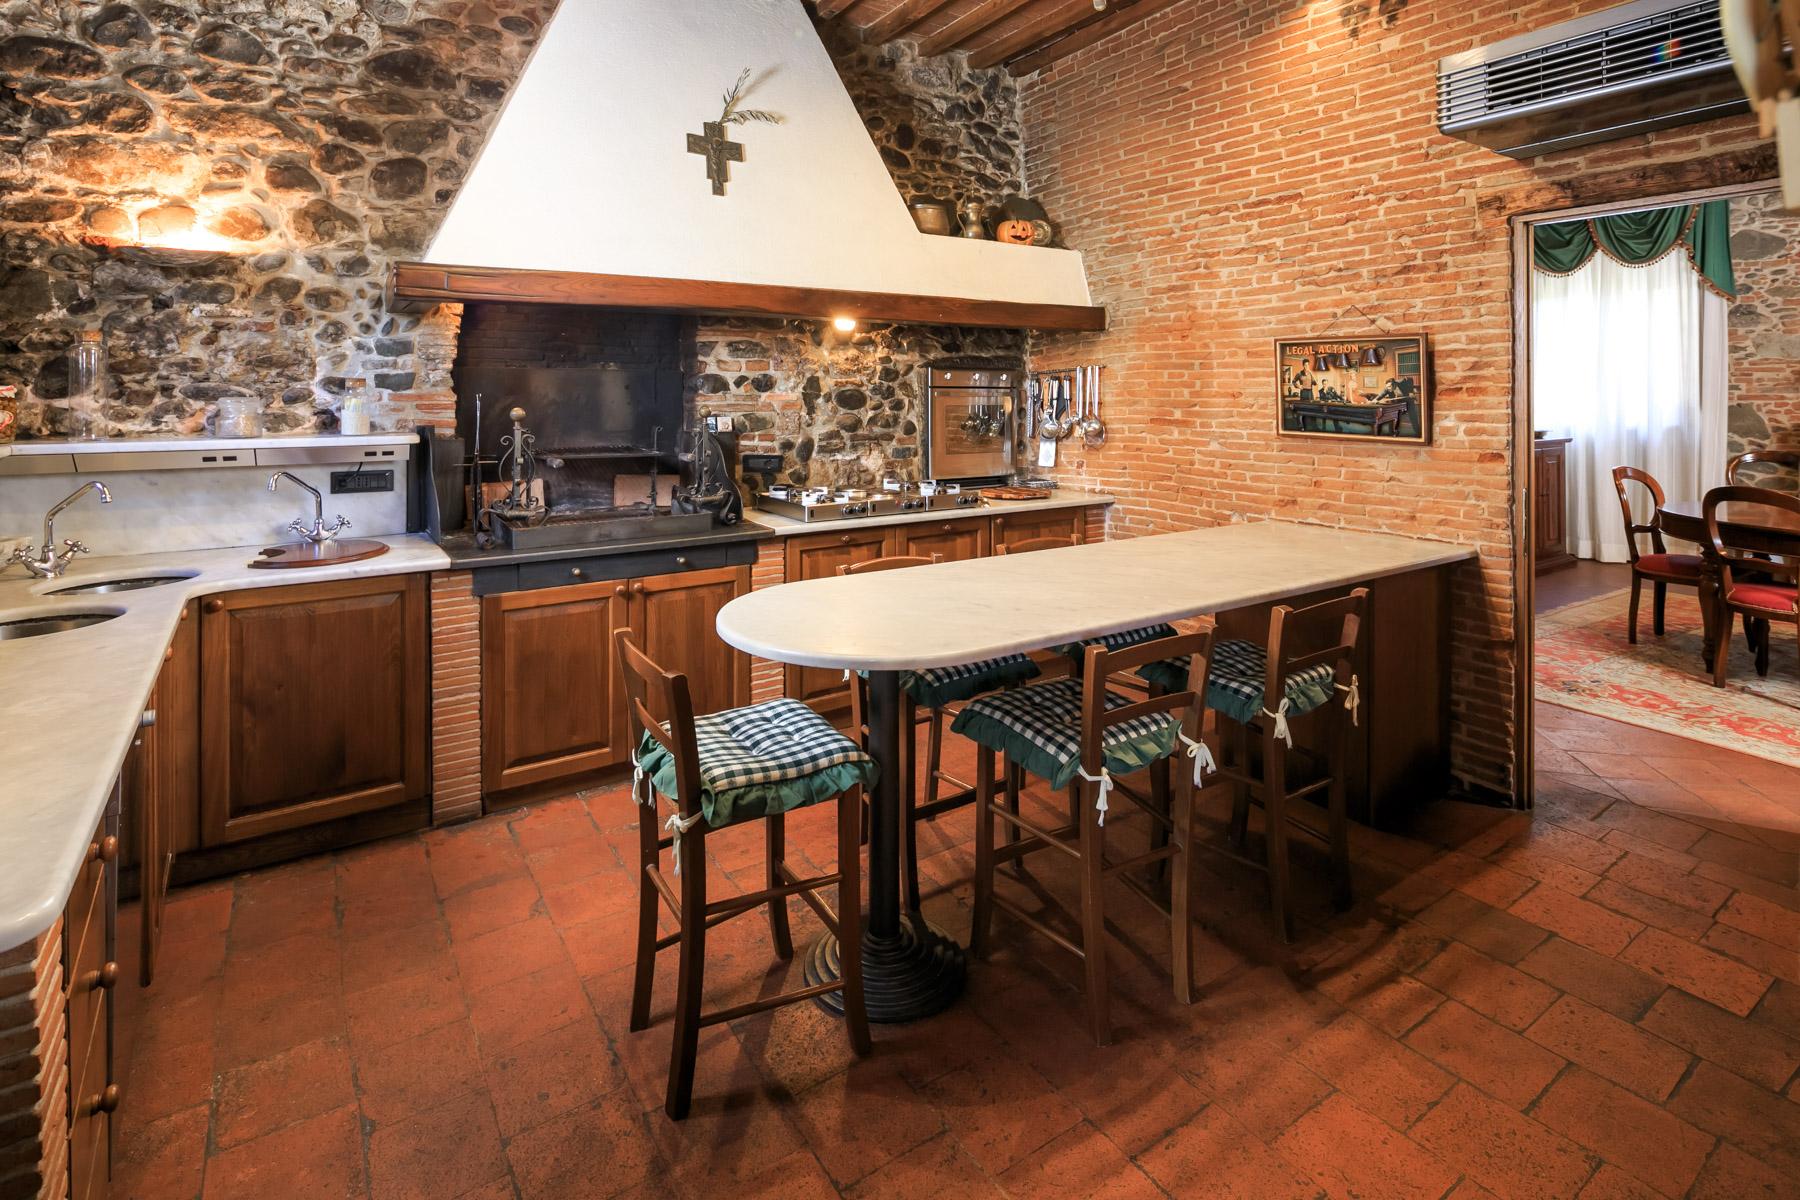 Rustico in Vendita a Lucca: 5 locali, 700 mq - Foto 7